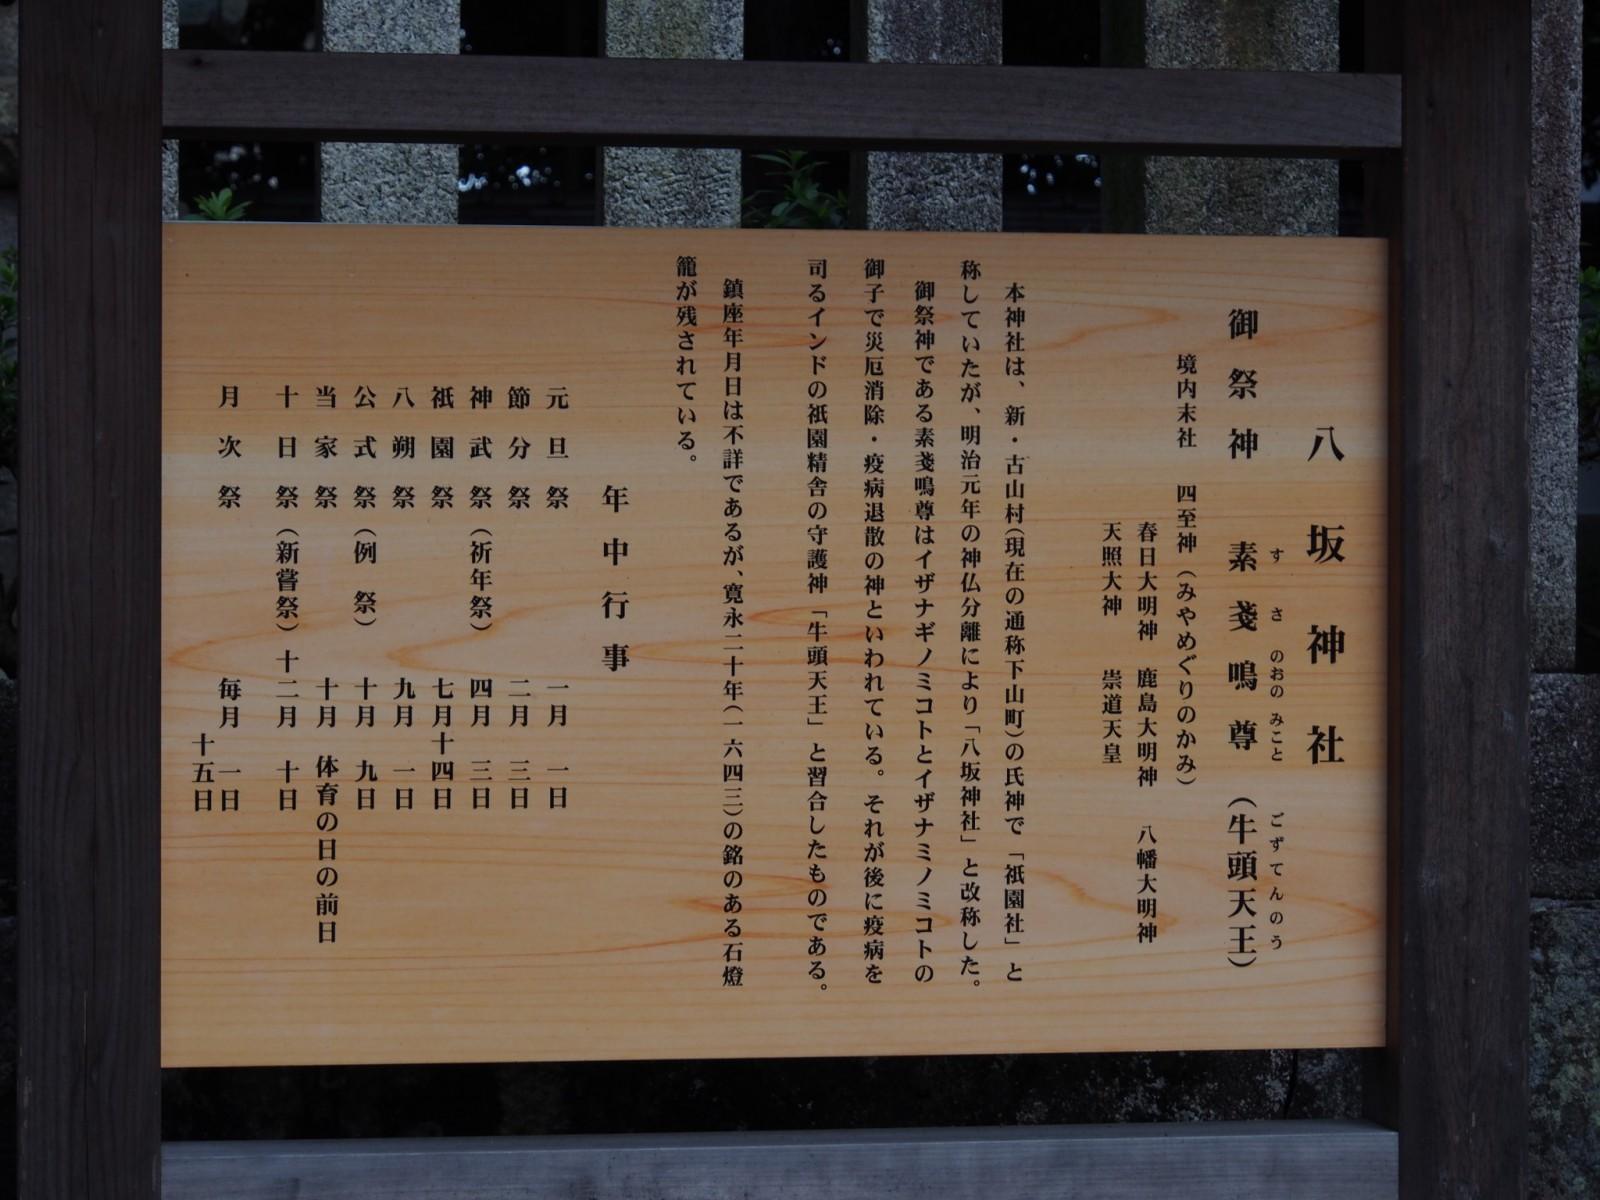 八坂神社(山町)の案内板